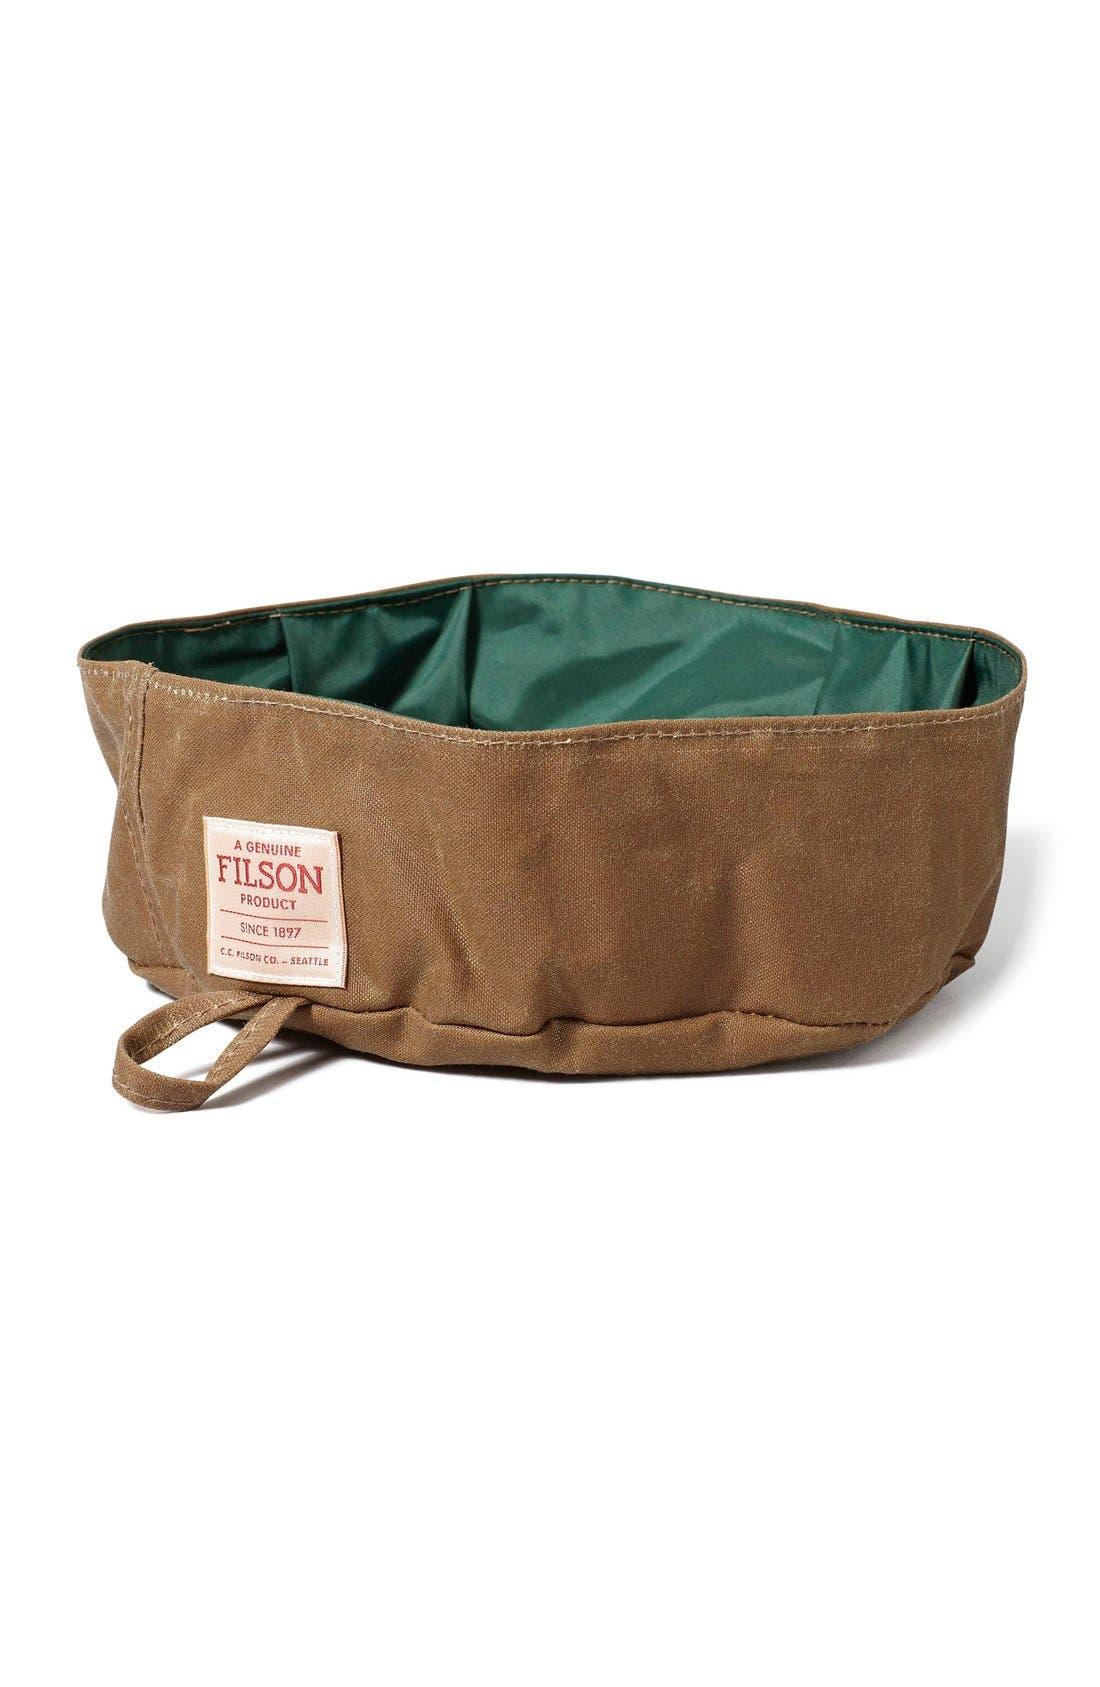 Collapsible Dog Bowl,                         Main,                         color, TAN